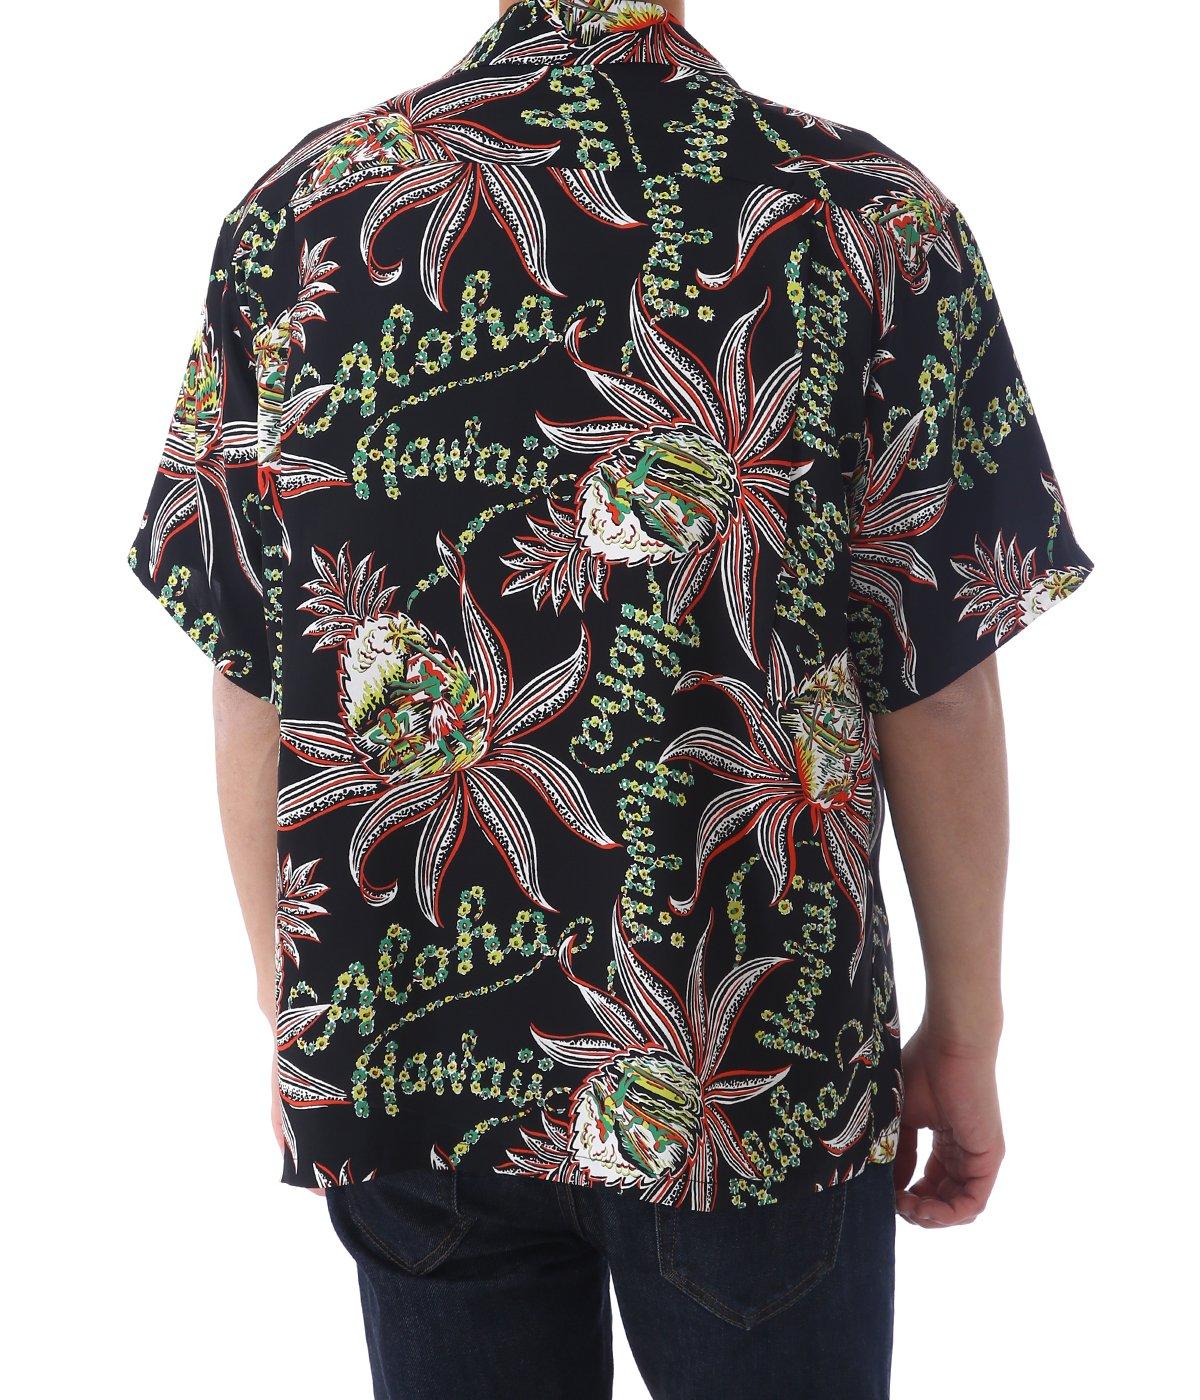 S/S HAWAIIAN SHIRT